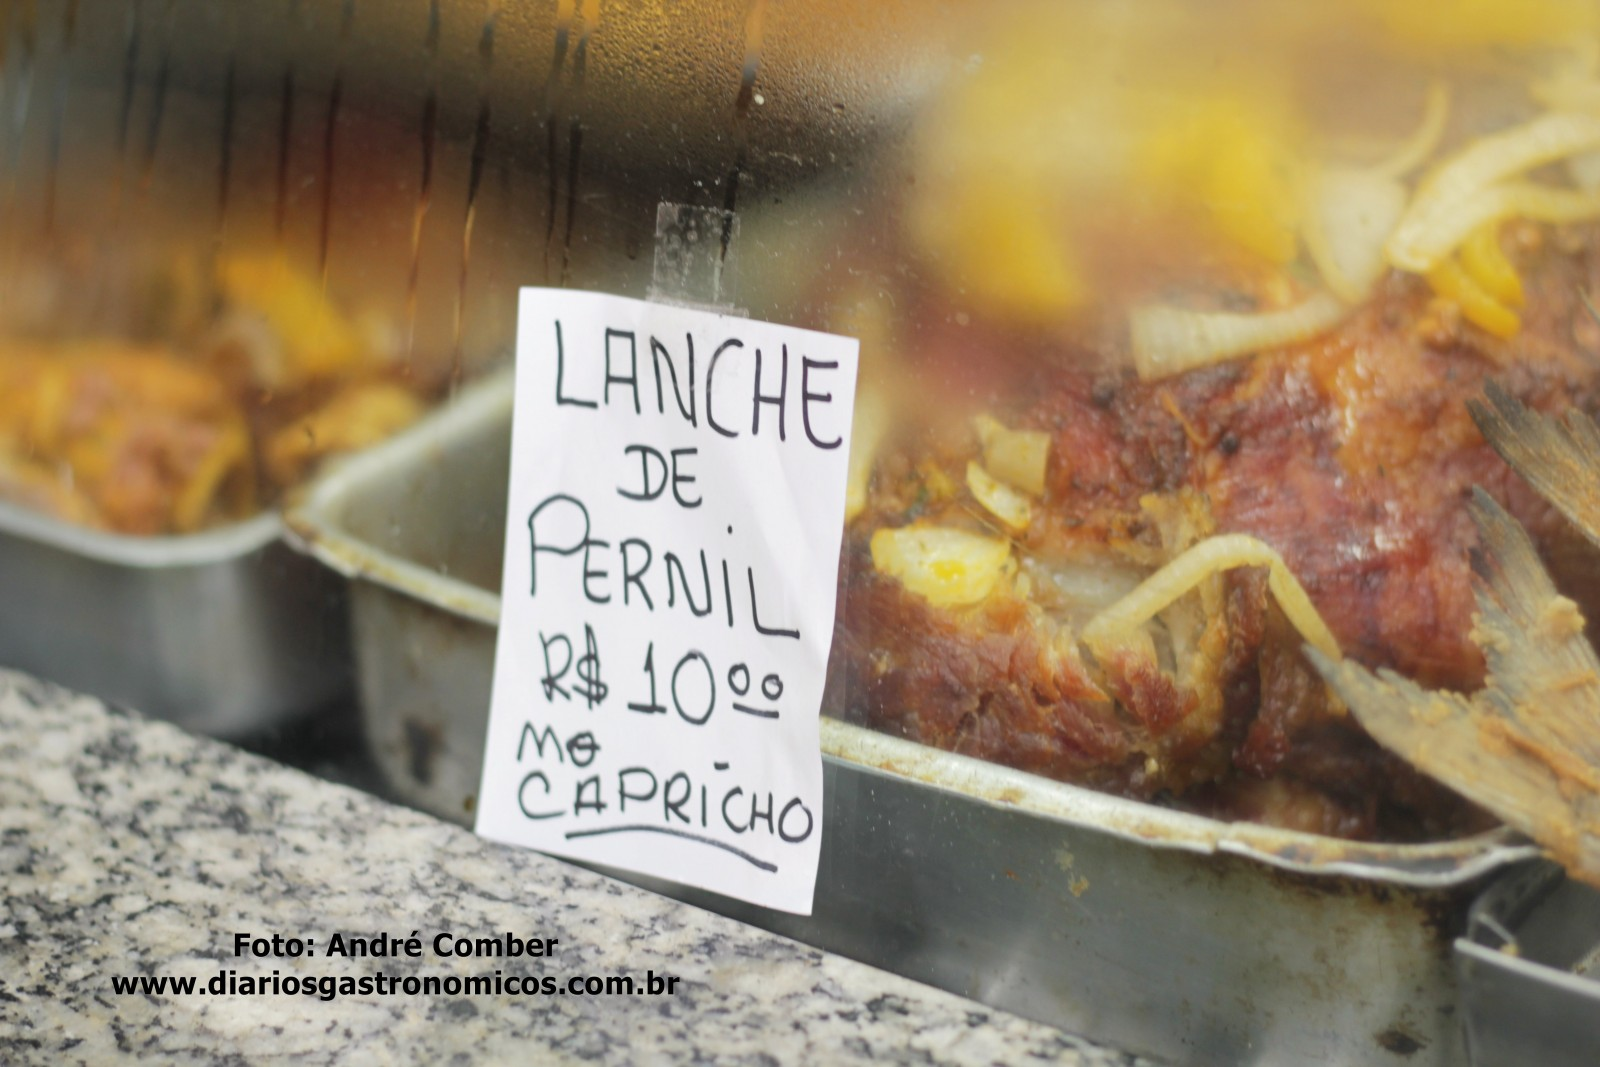 Mercado da Lapa, Sao Paulo, lanche de pernil